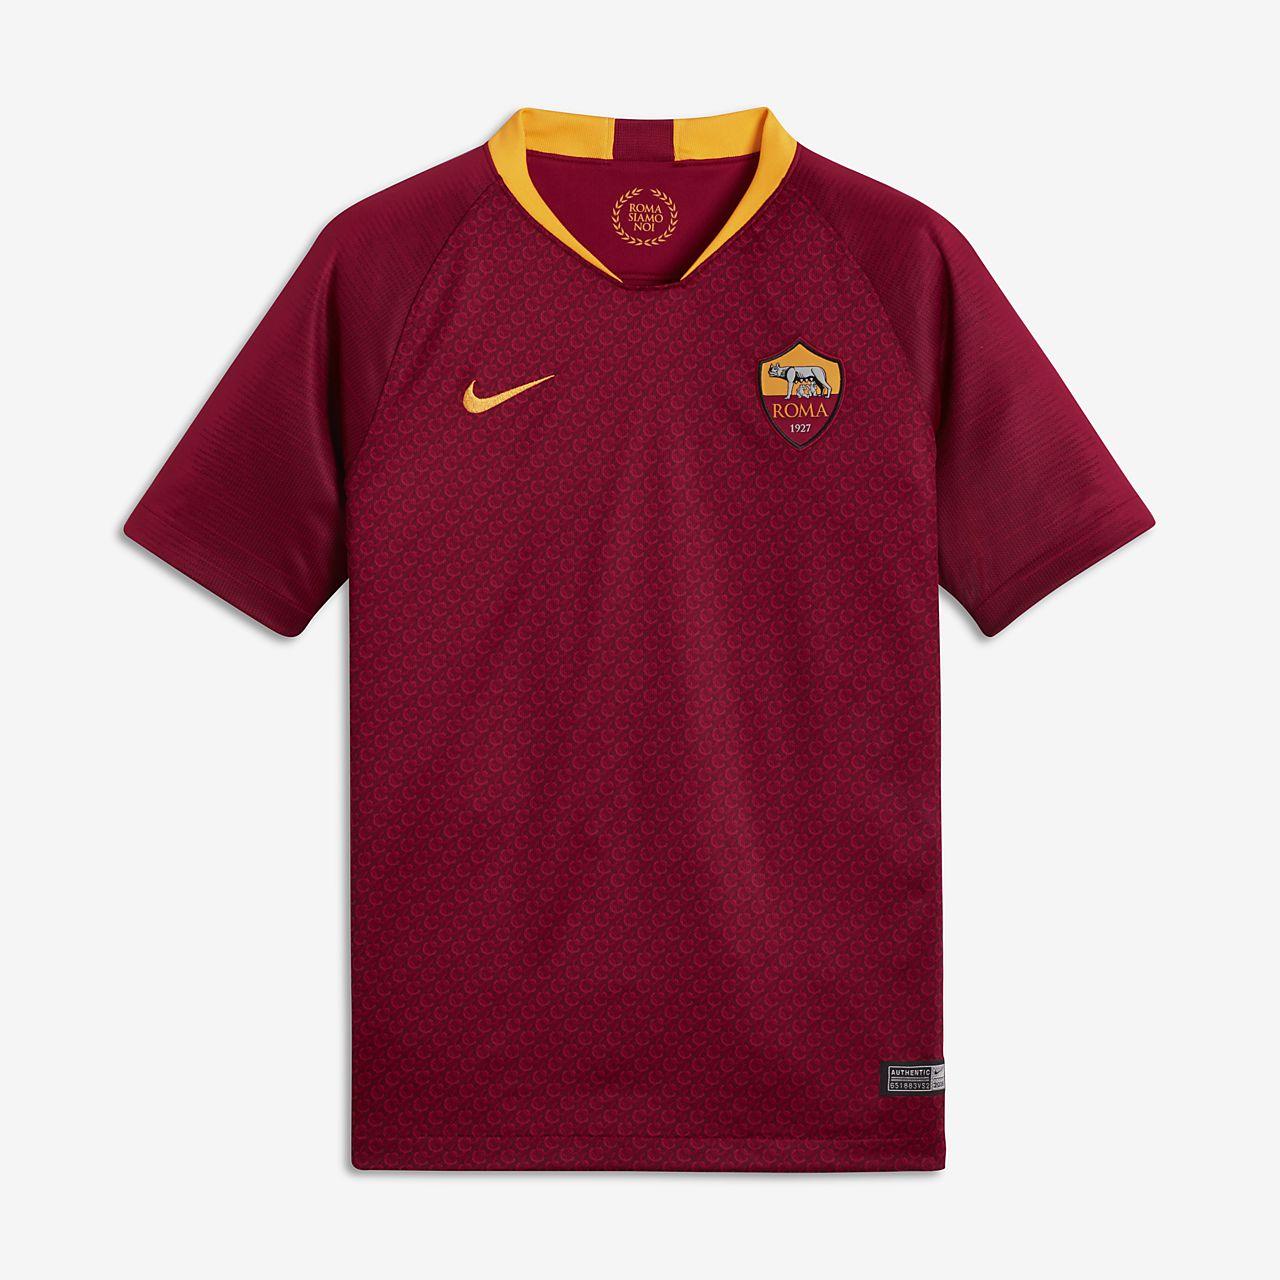 a8b2696be42 2018 19 A.S. Roma Stadium Home Older Kids  Football Shirt. Nike.com DK